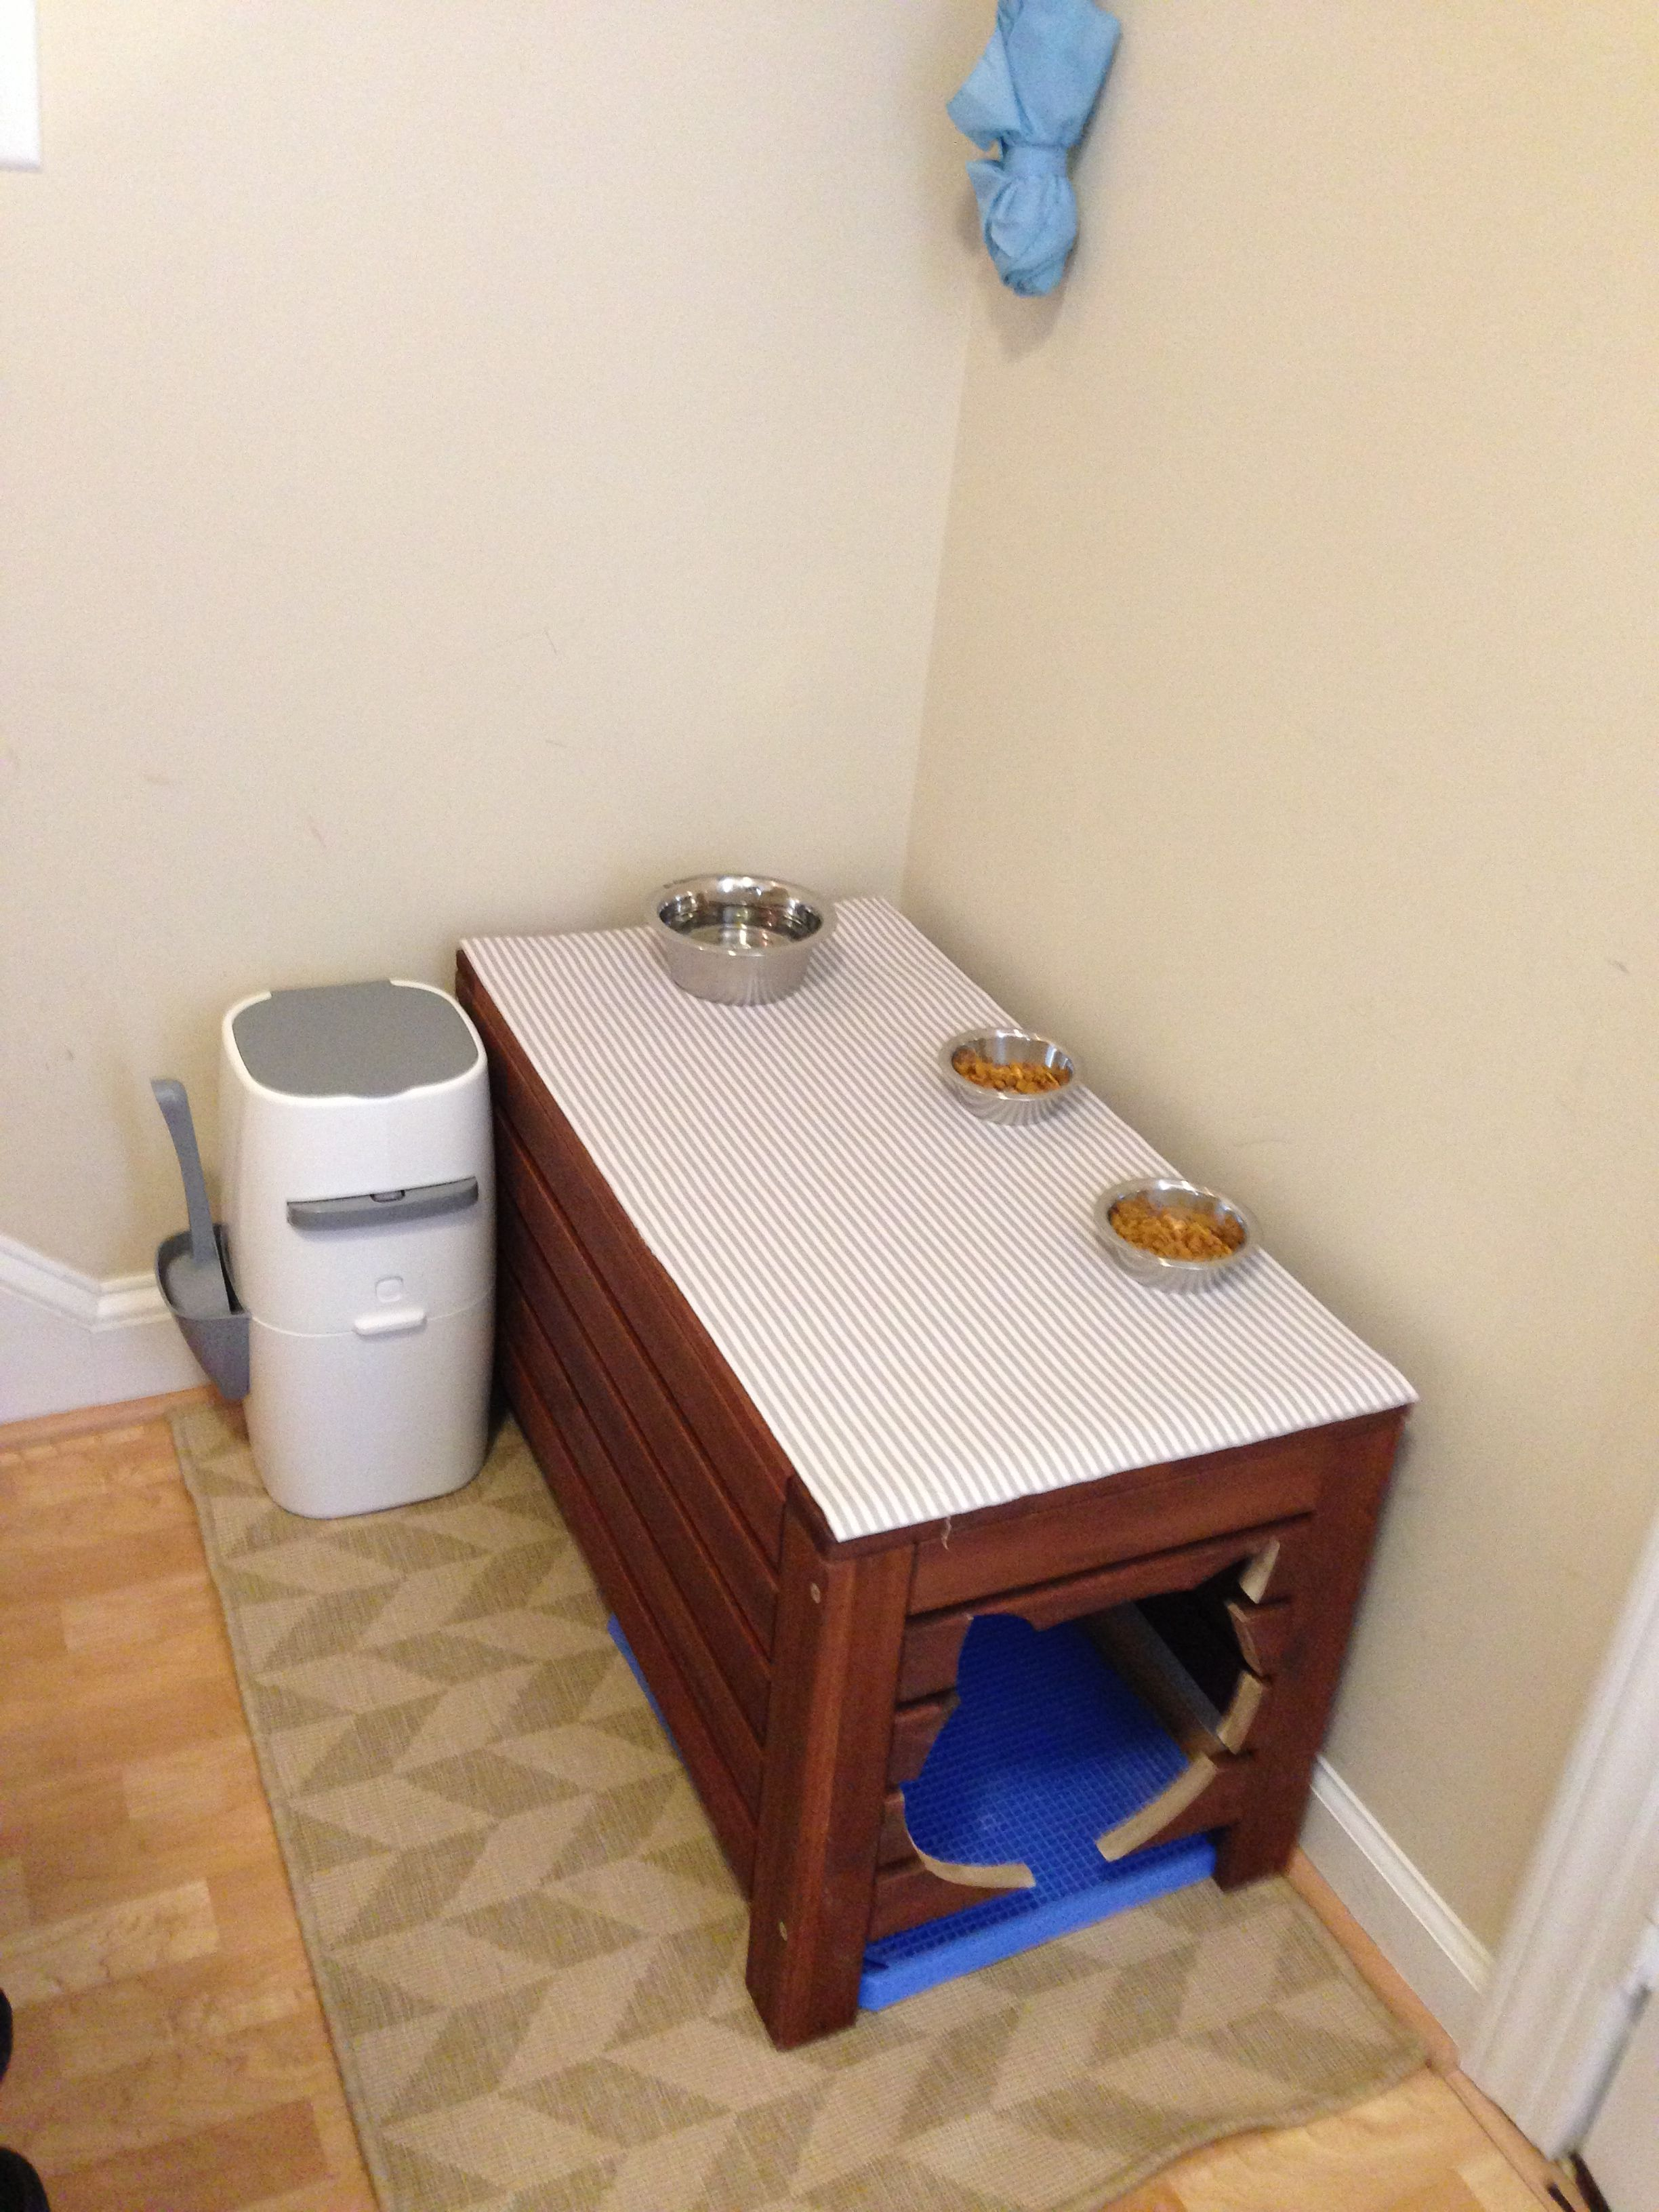 My cat litter box/feeding station. I did an IKEA hack of an ...